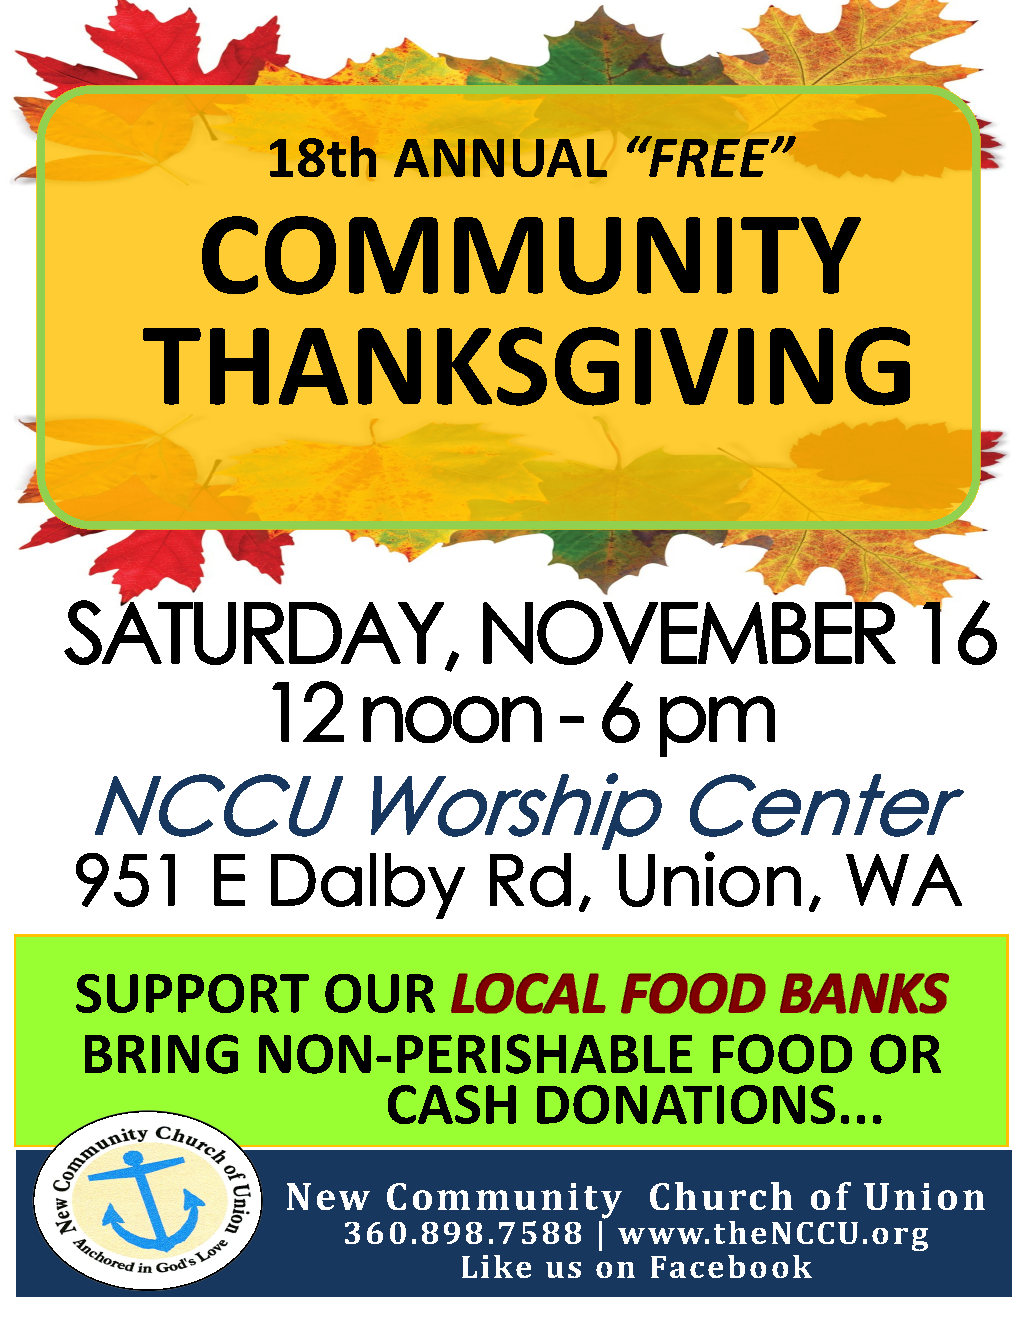 2019 NCCU Thanksgiving Flyer